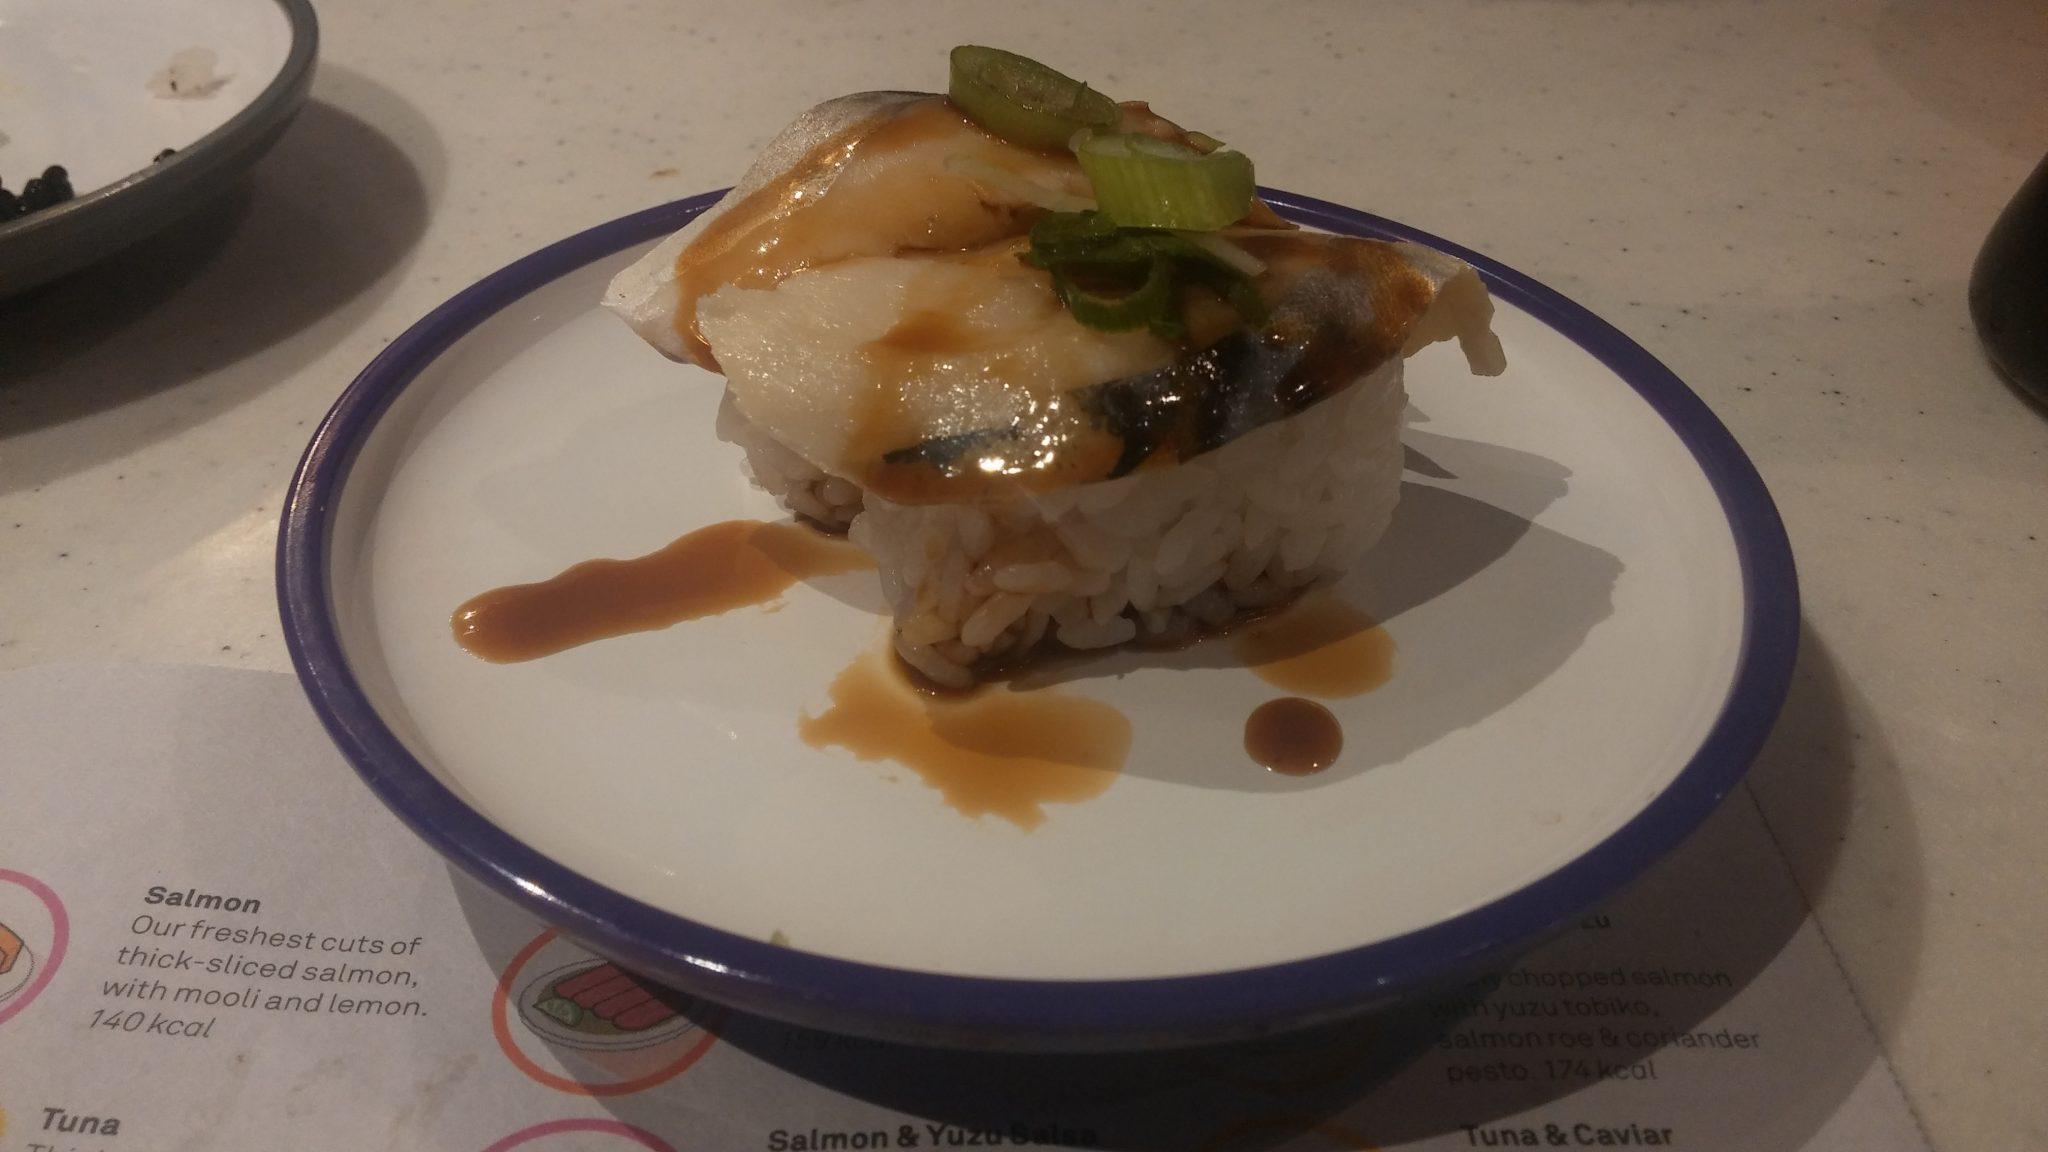 Teriyaki glazed cured mackerel slices, spring onion